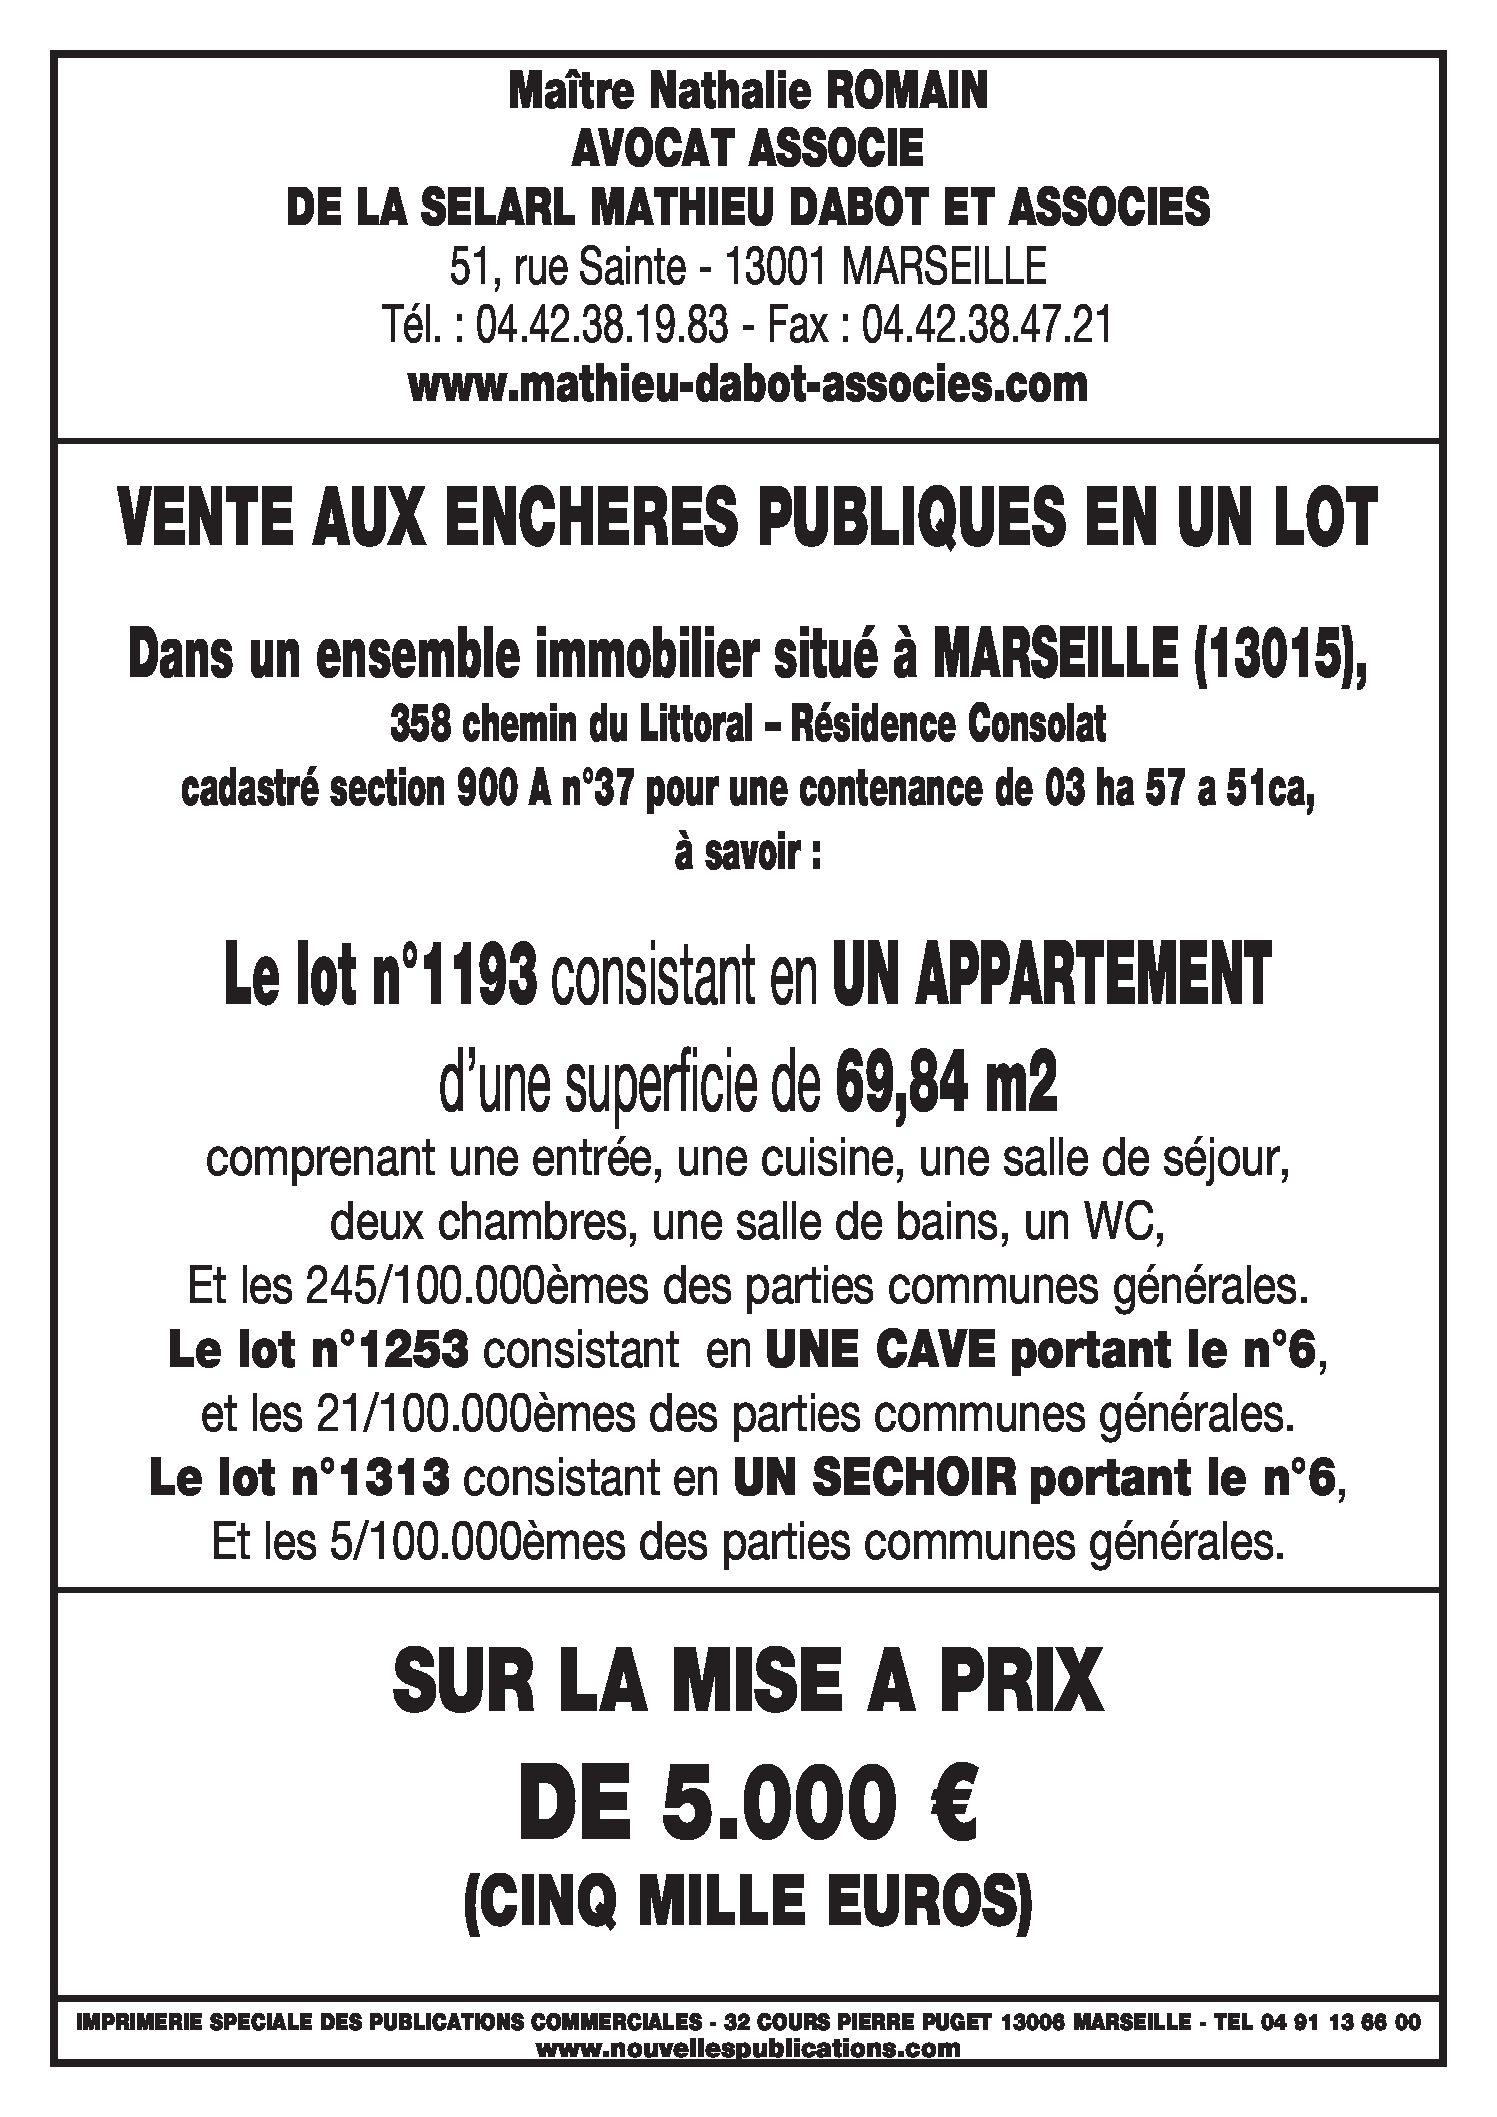 Affiche ADJ0210909_AFF04_SEM28 (1)